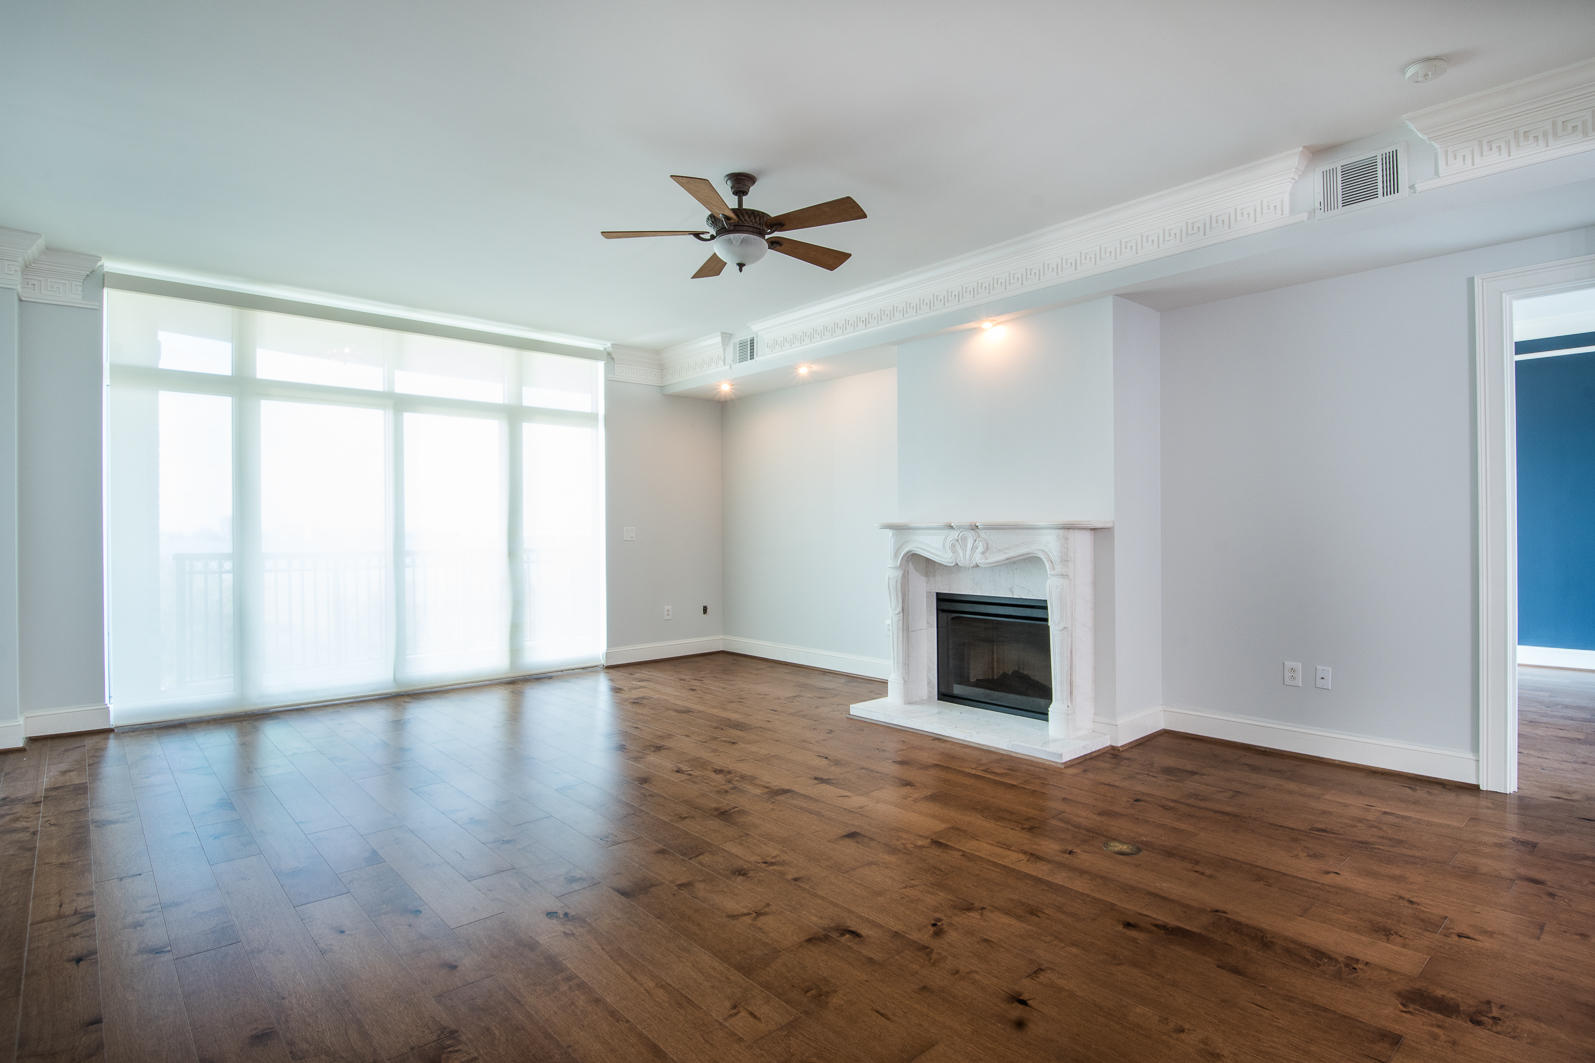 Renaissance On Chas Harbor Homes For Sale - 144 Plaza, Mount Pleasant, SC - 4